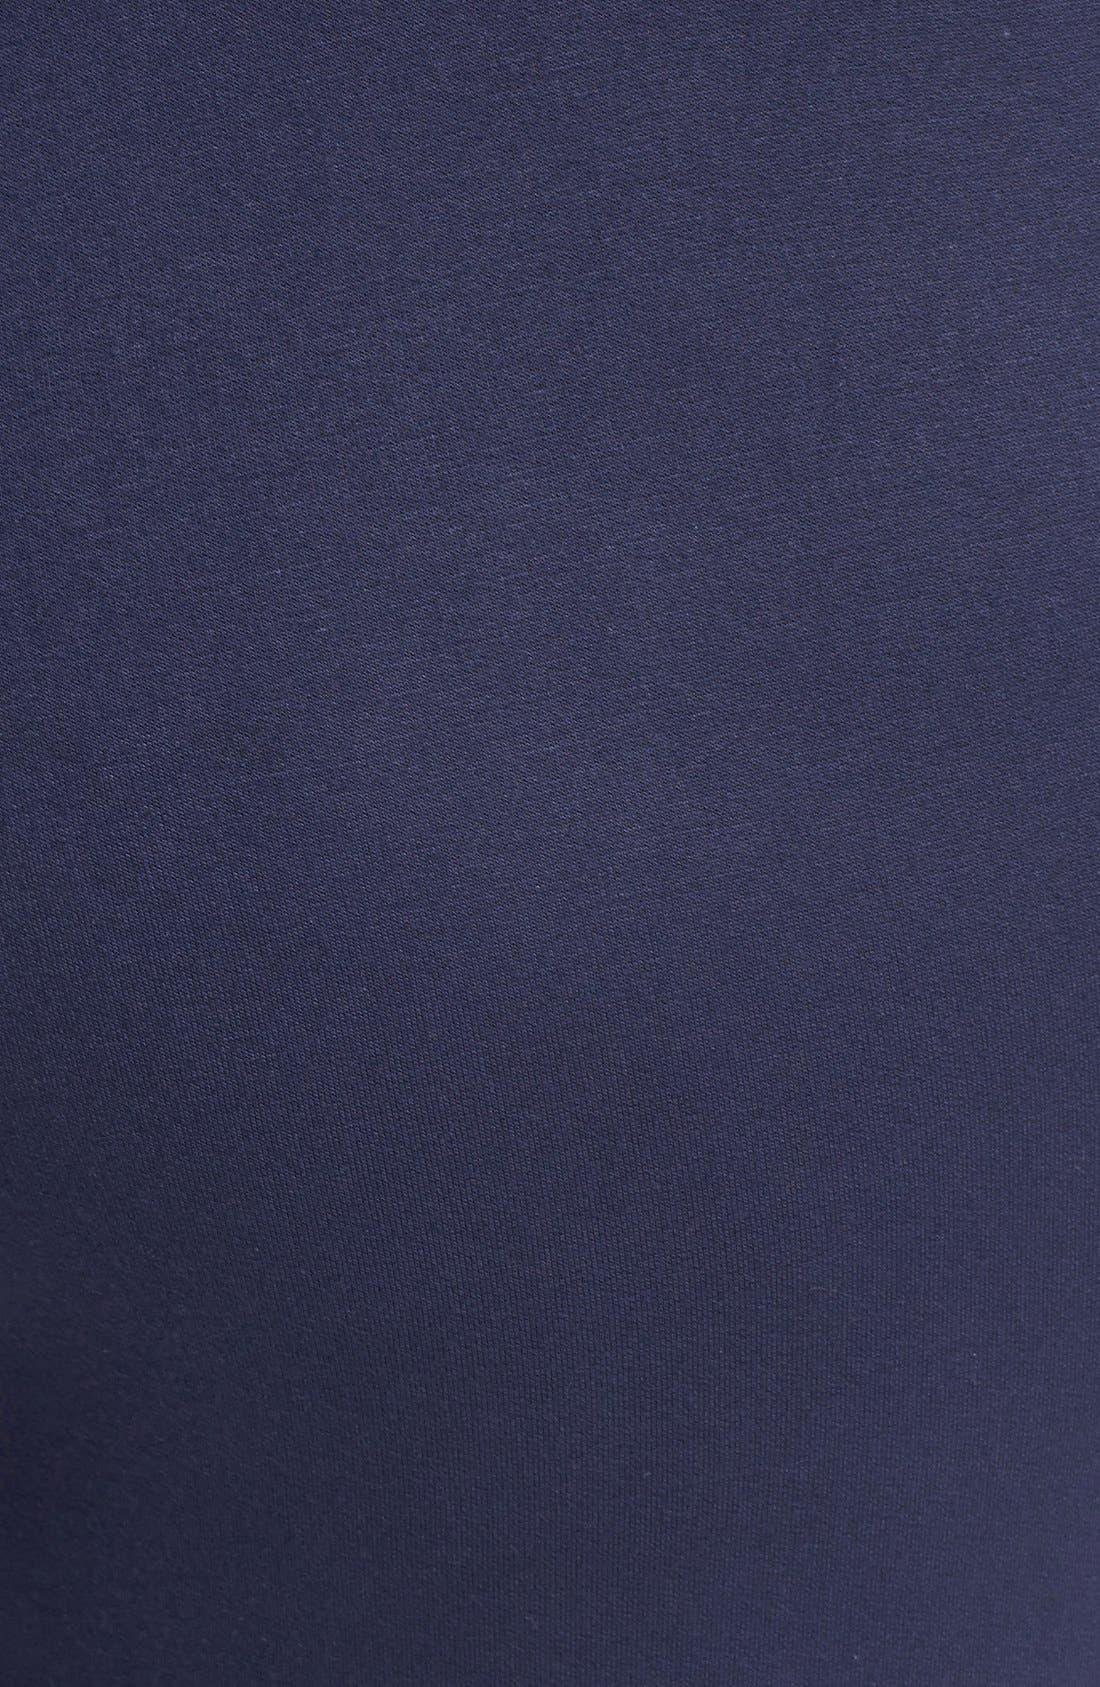 Alternate Image 3  - Shimera Ruched Waist Lounge Pants (Plus Size)